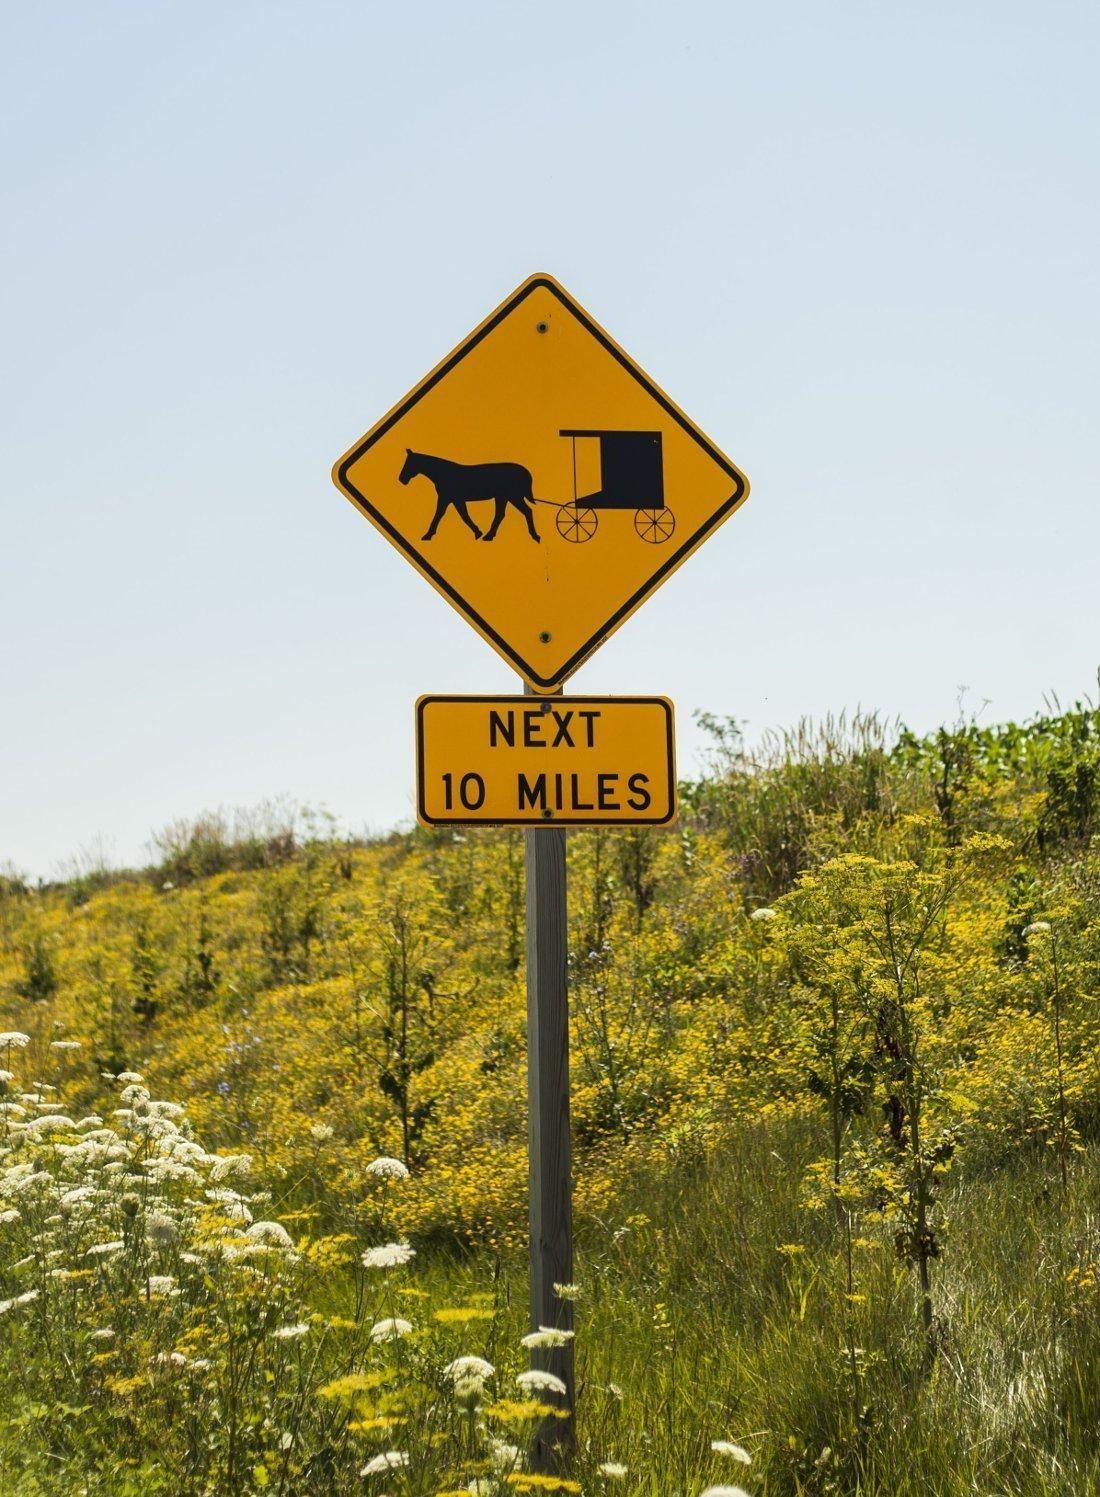 Amish next 10 miles